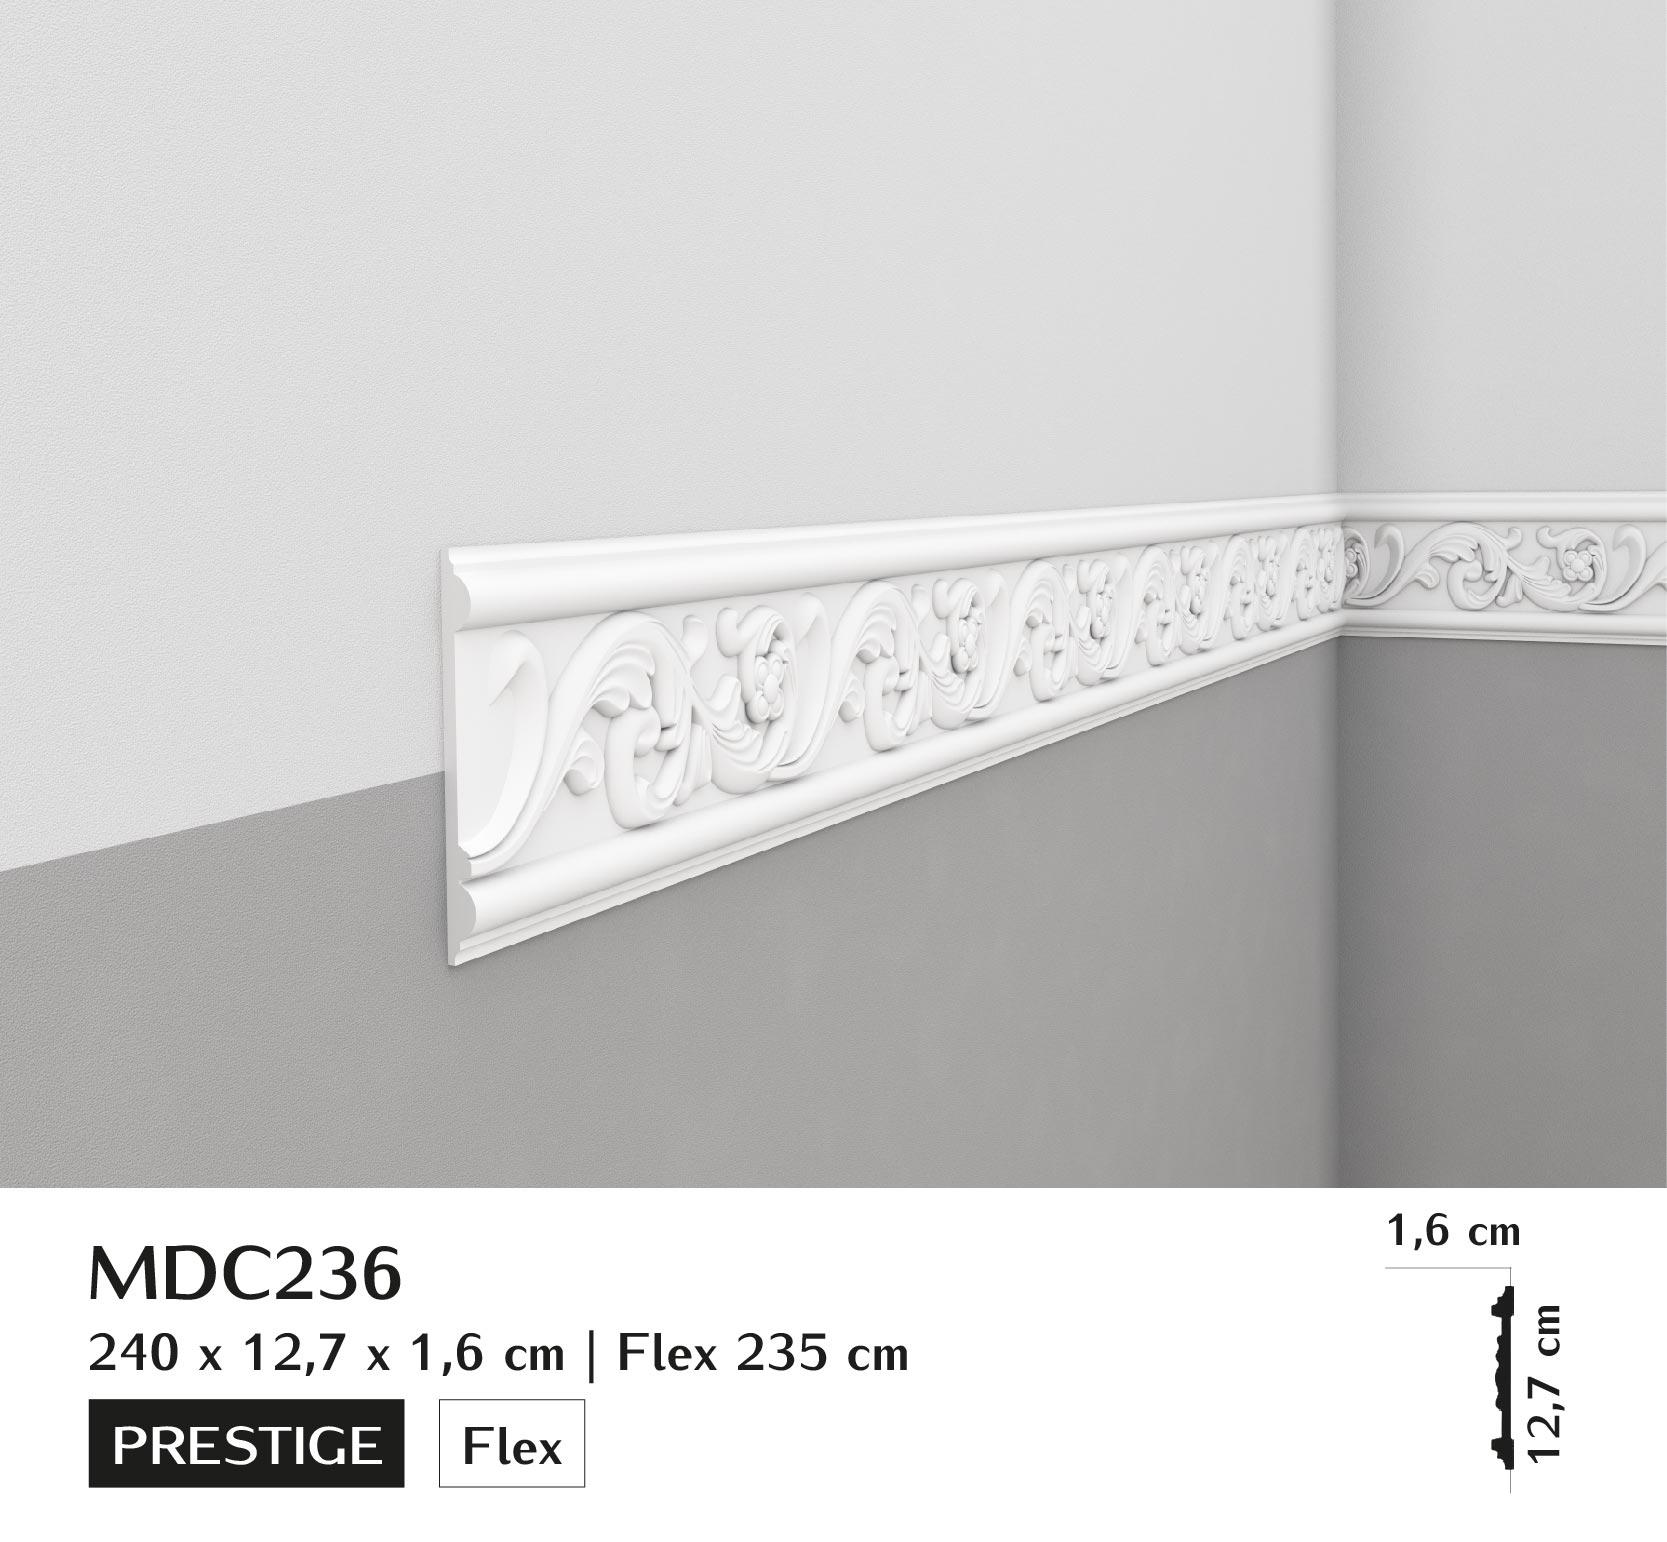 Mdc236